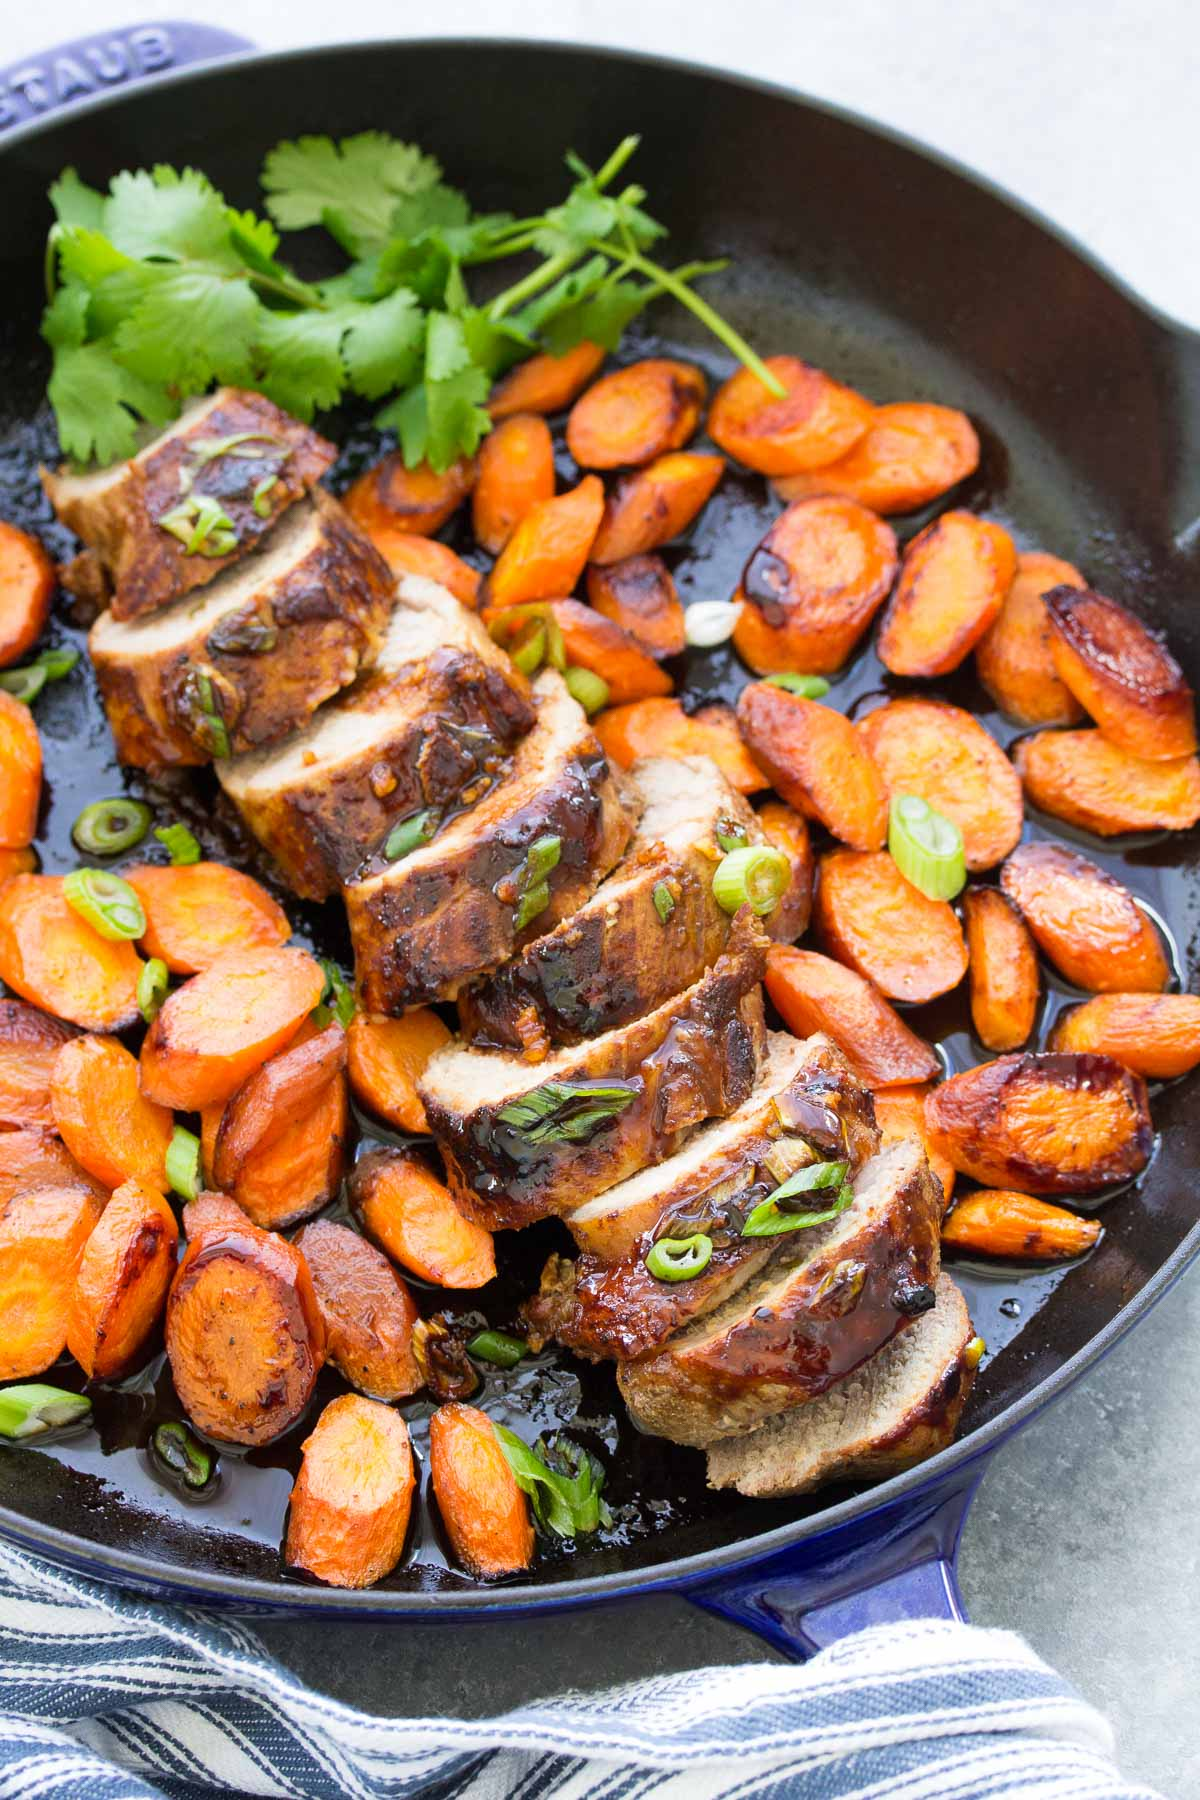 honey hoisin pork tenderloin with carrots in a cast iron skillet